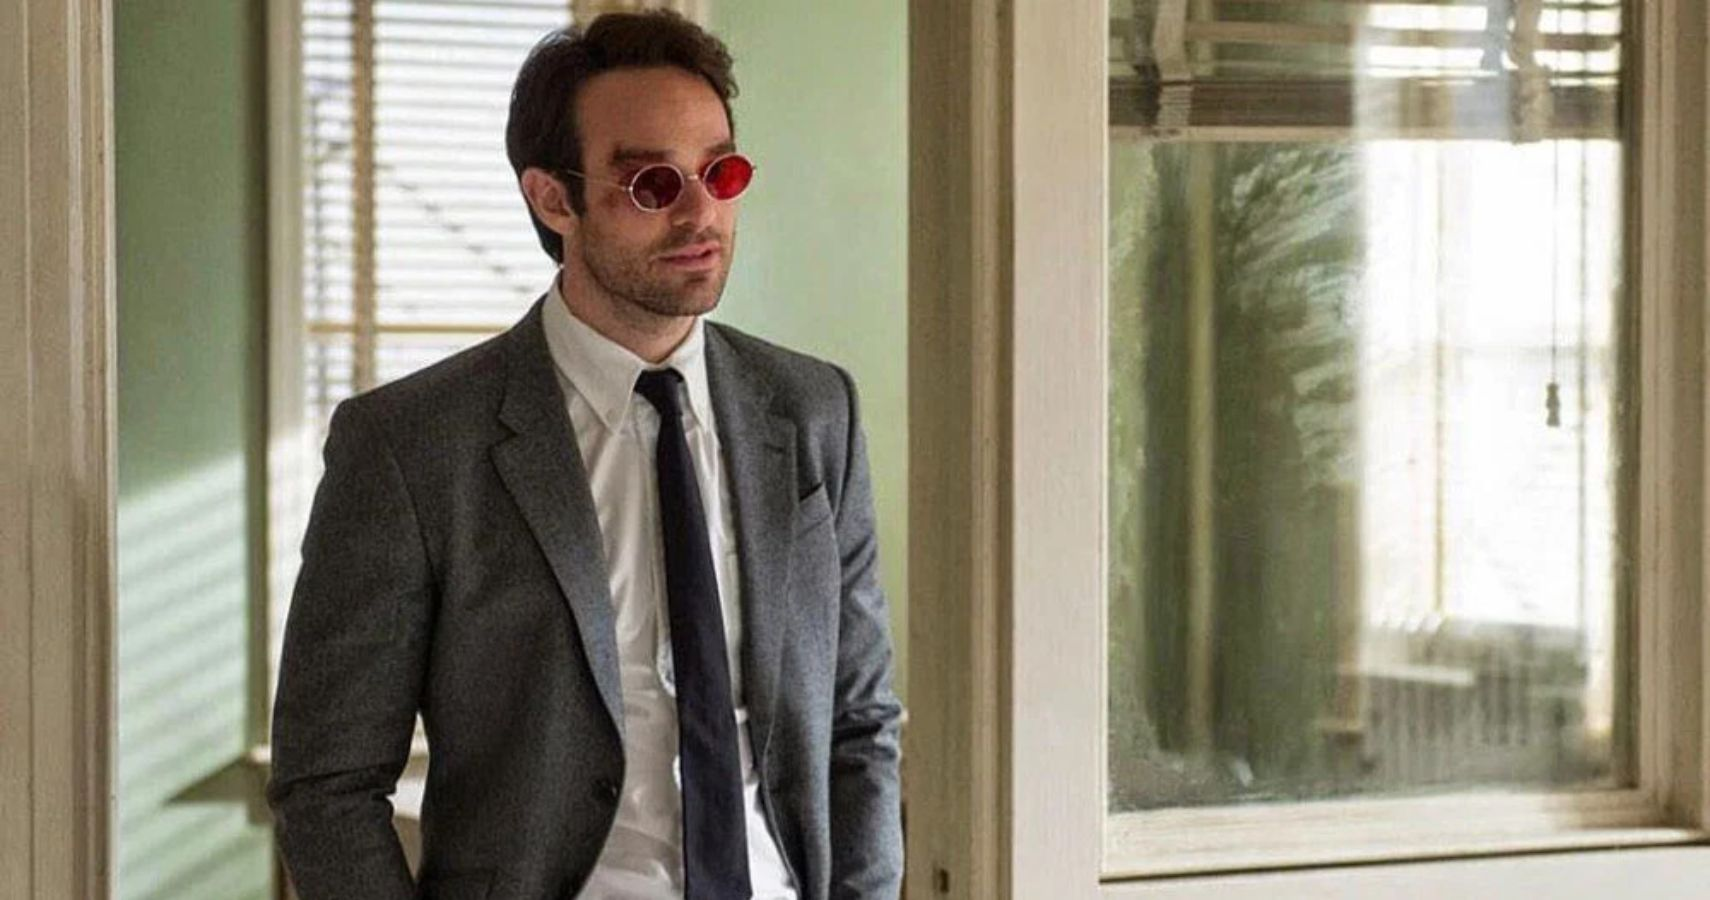 Fans Think Charlie Cox's Beard Tells Us Matt Murdock Will Be In Spider-Man: No Way Home